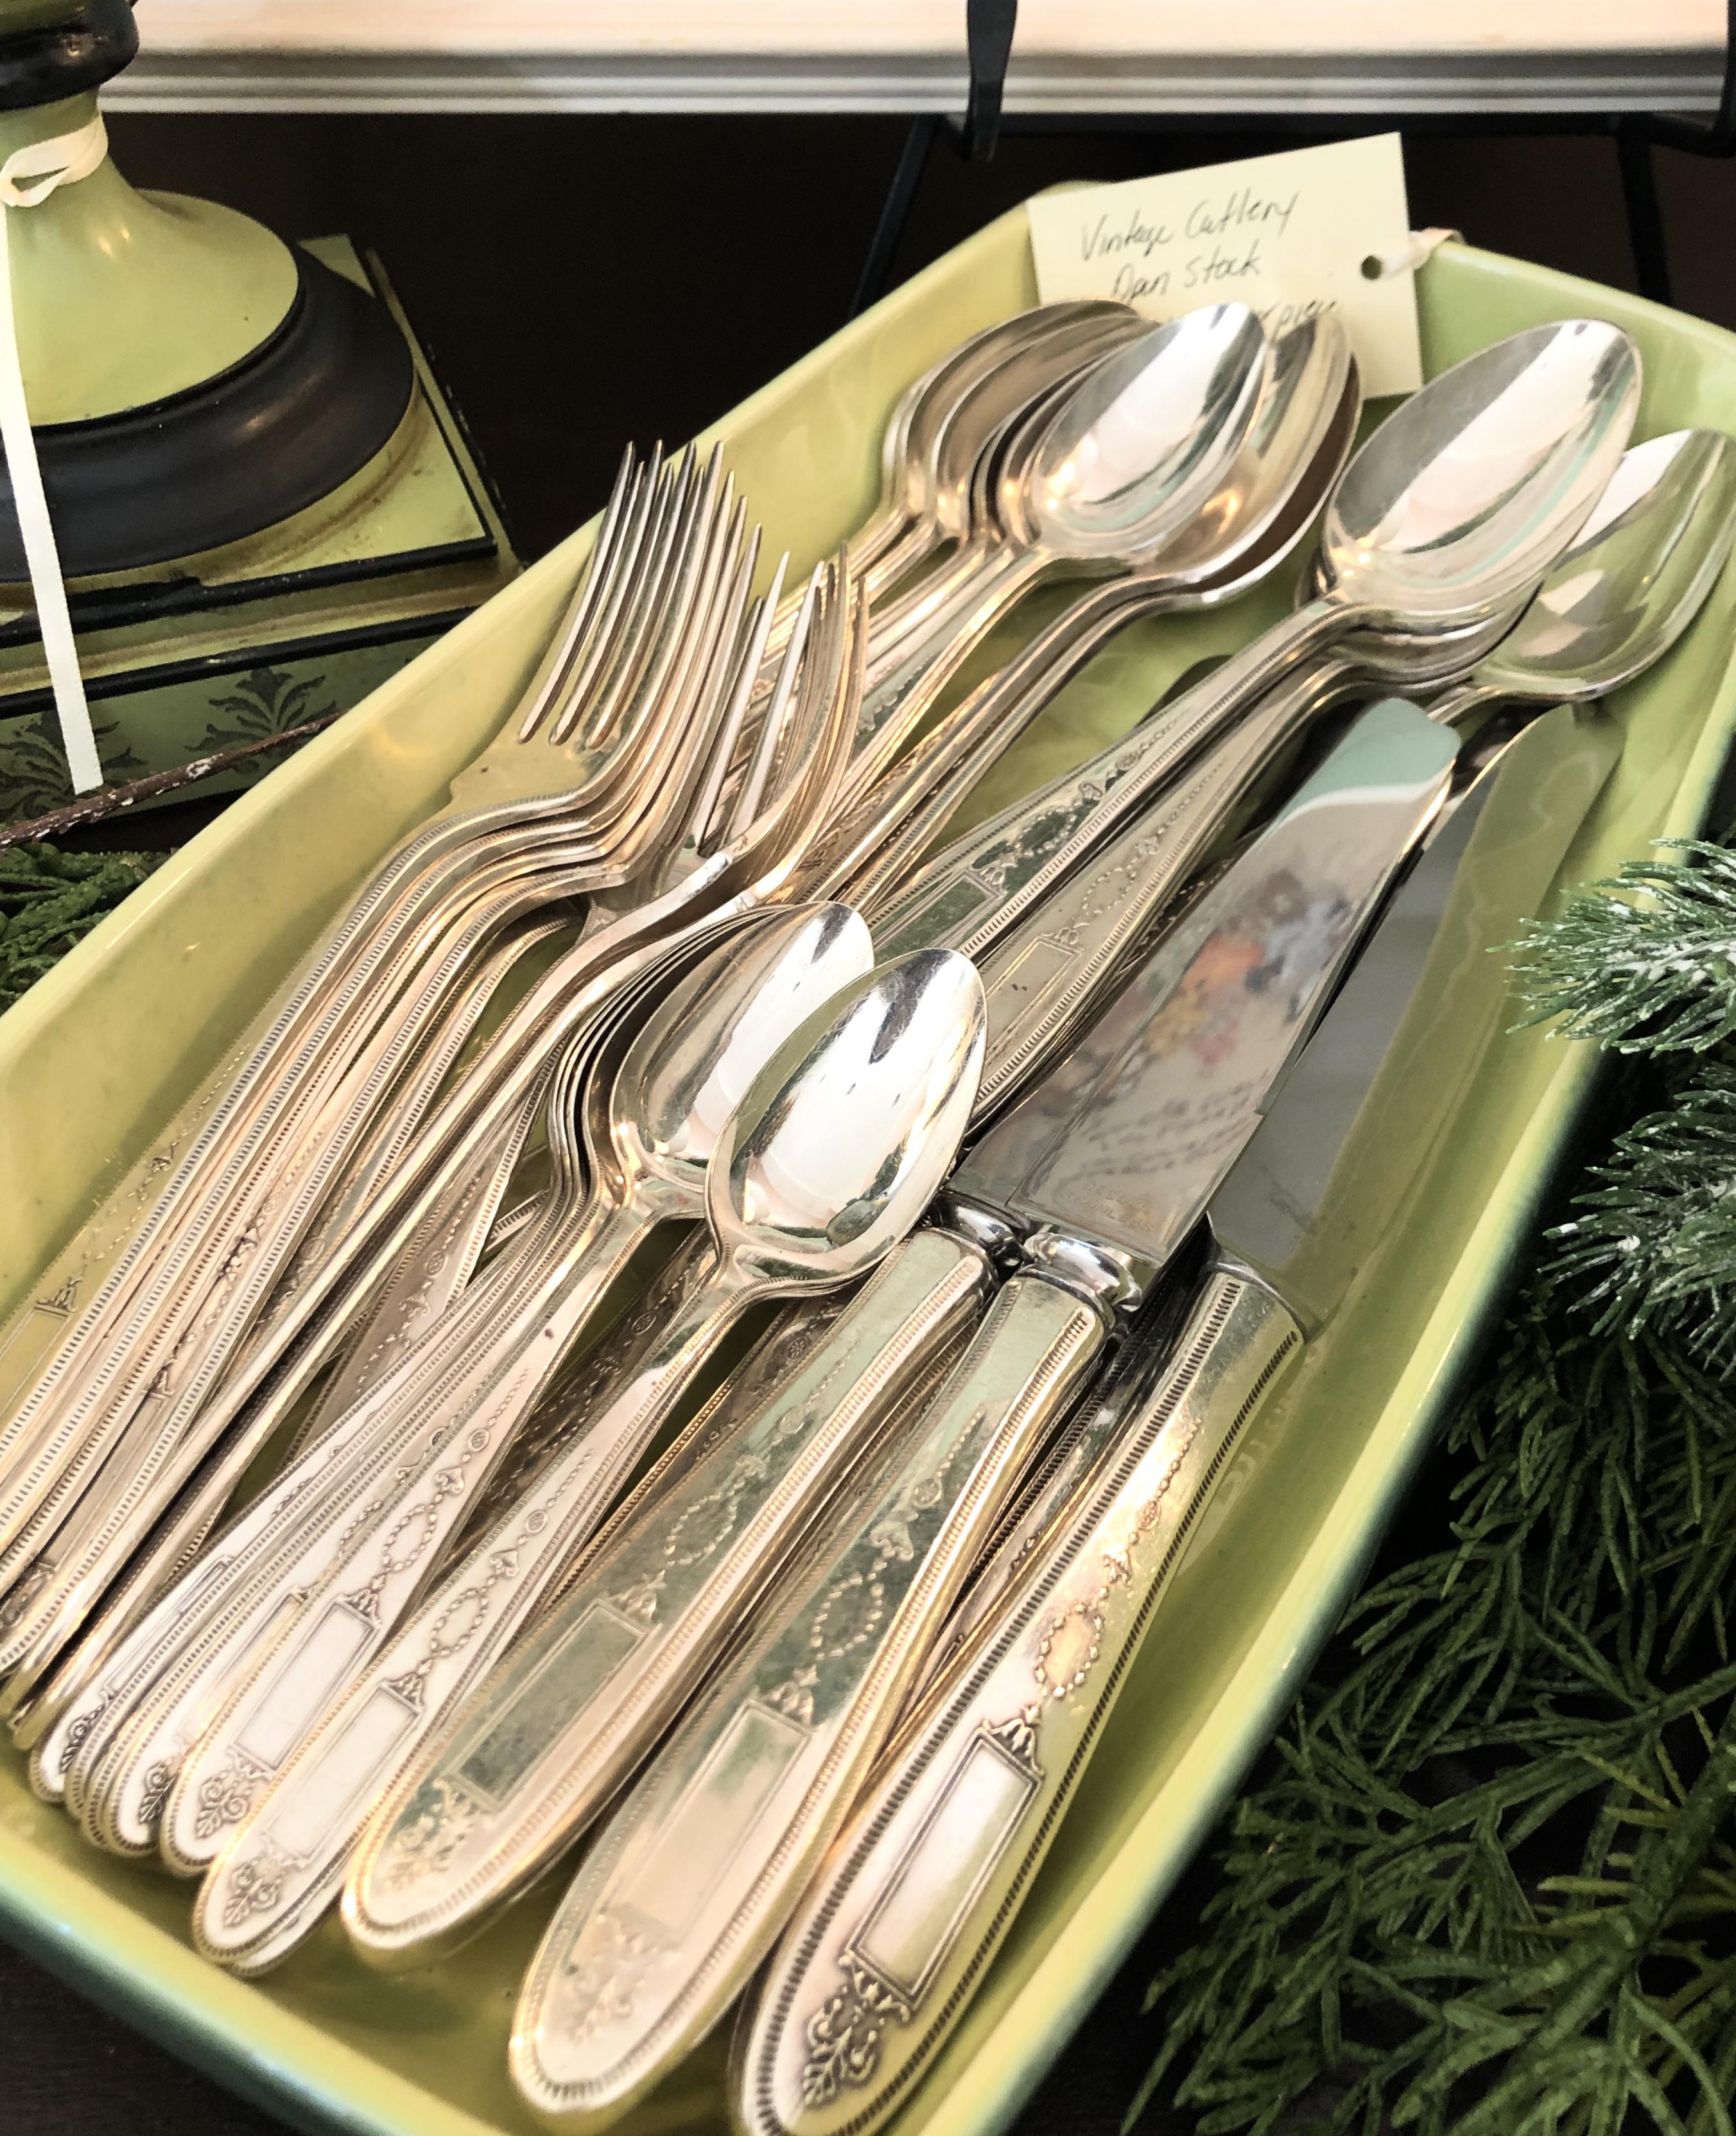 Open Stock Vintage Cutlery